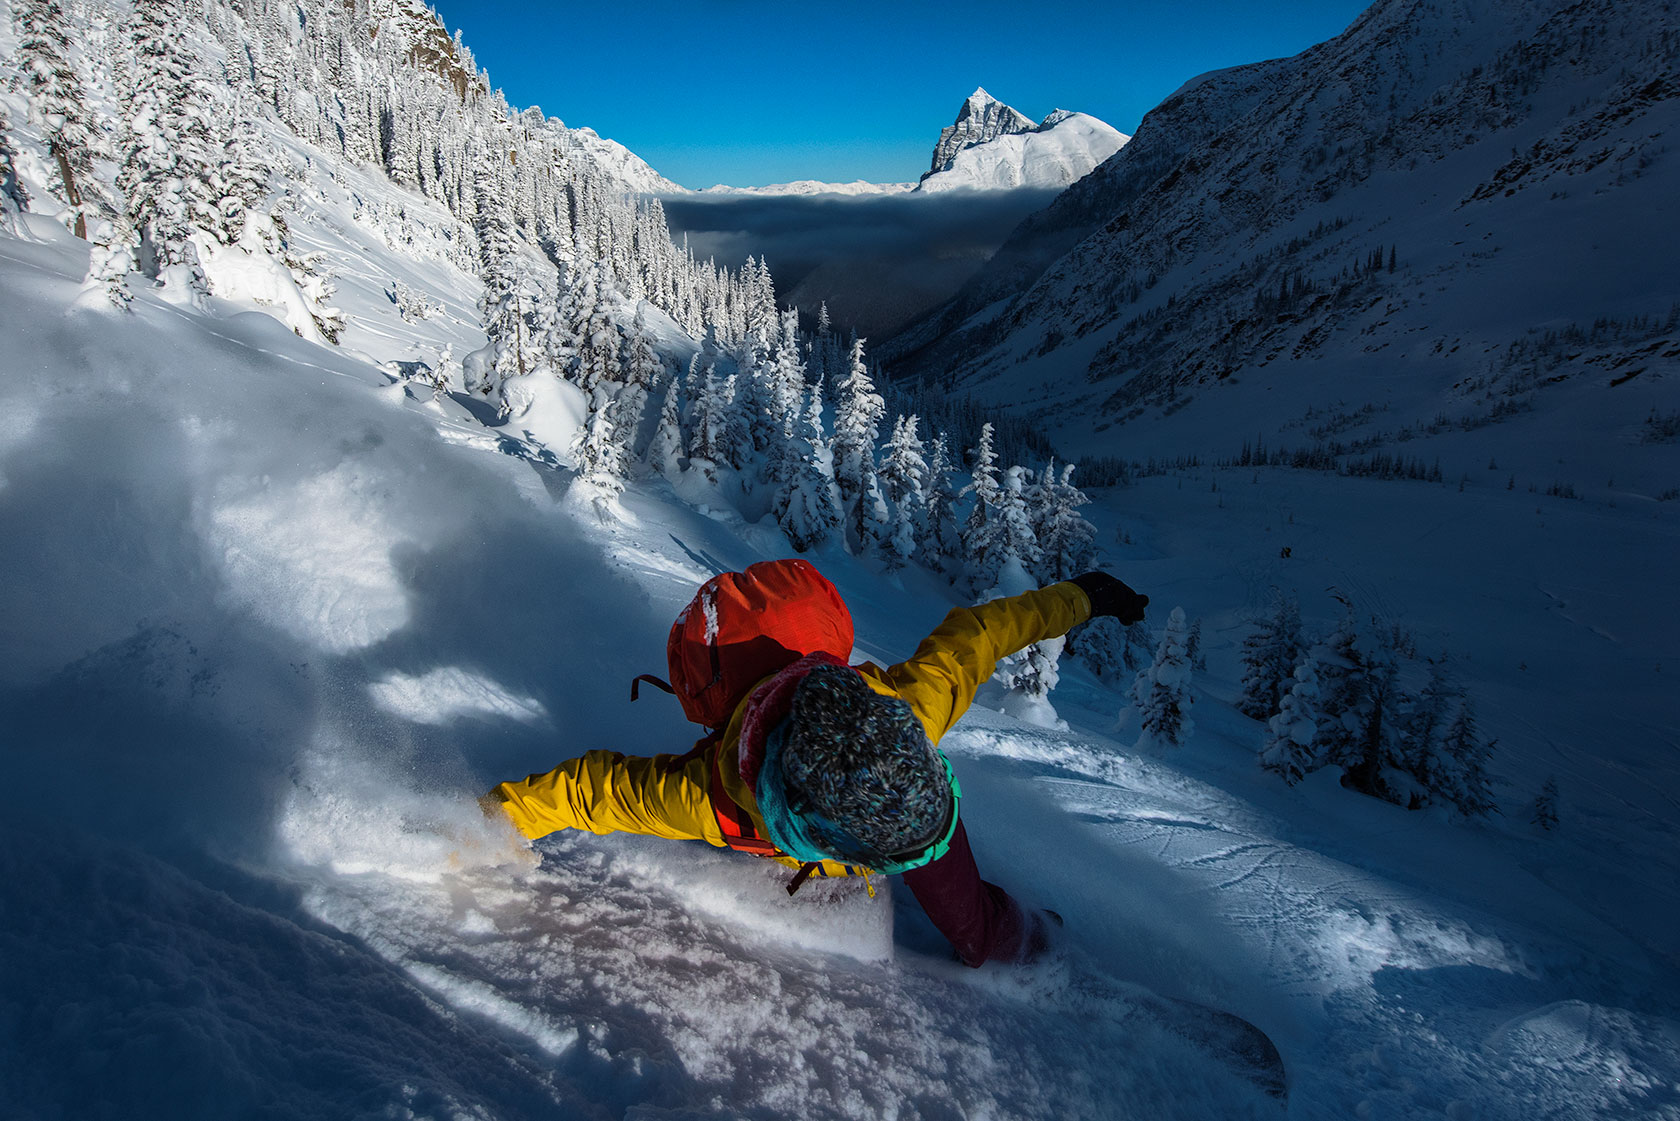 austin-trigg-patagonia-banff-alberta-winter-Audrey-Rogers-pass-splitboard-ski-touring-sunset-ride-backcountry-adventure.jpg